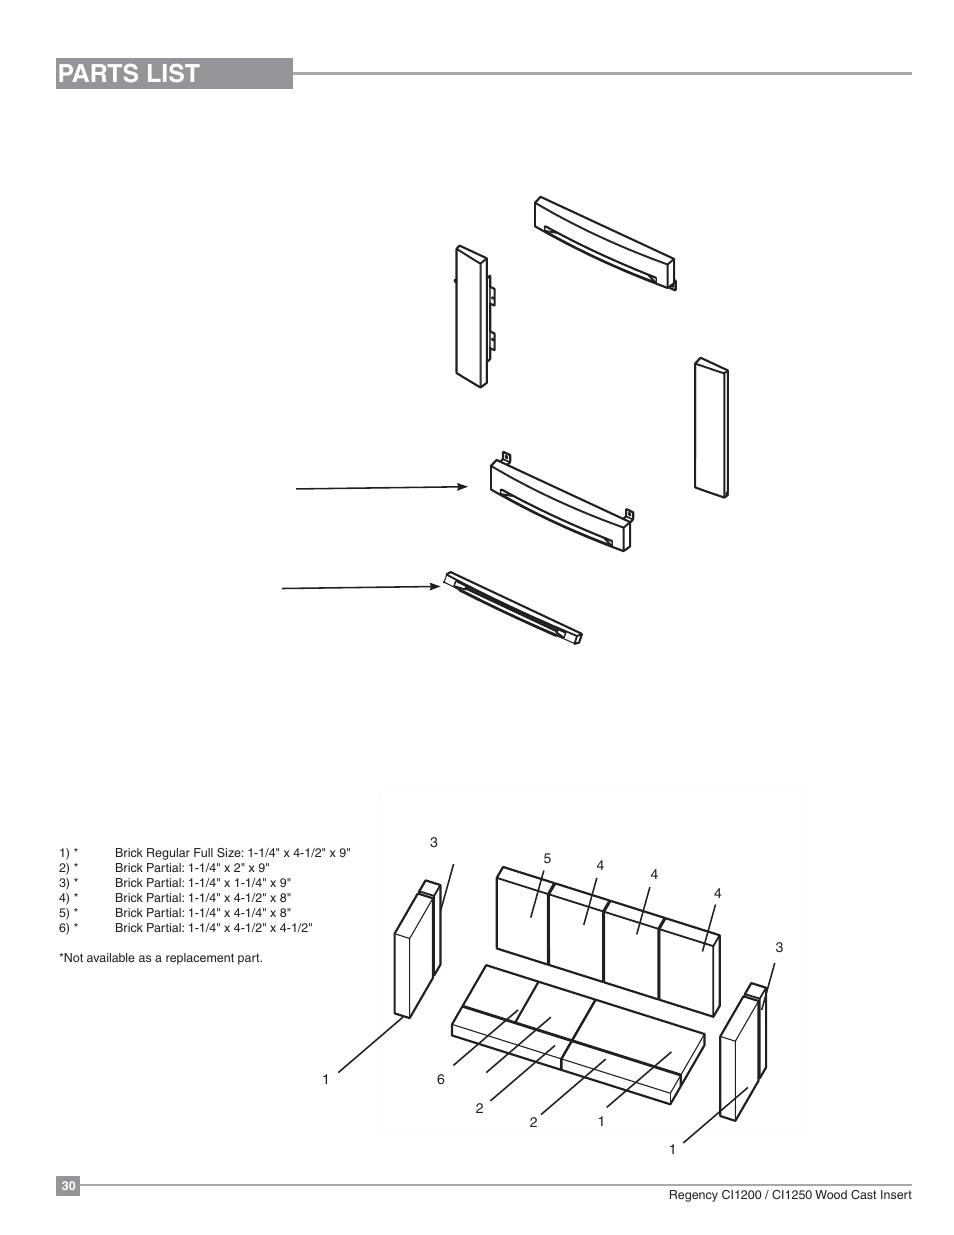 medium resolution of parts list cast faceplate firebrick regency alterra ci1250 small wood insert user manual page 30 32